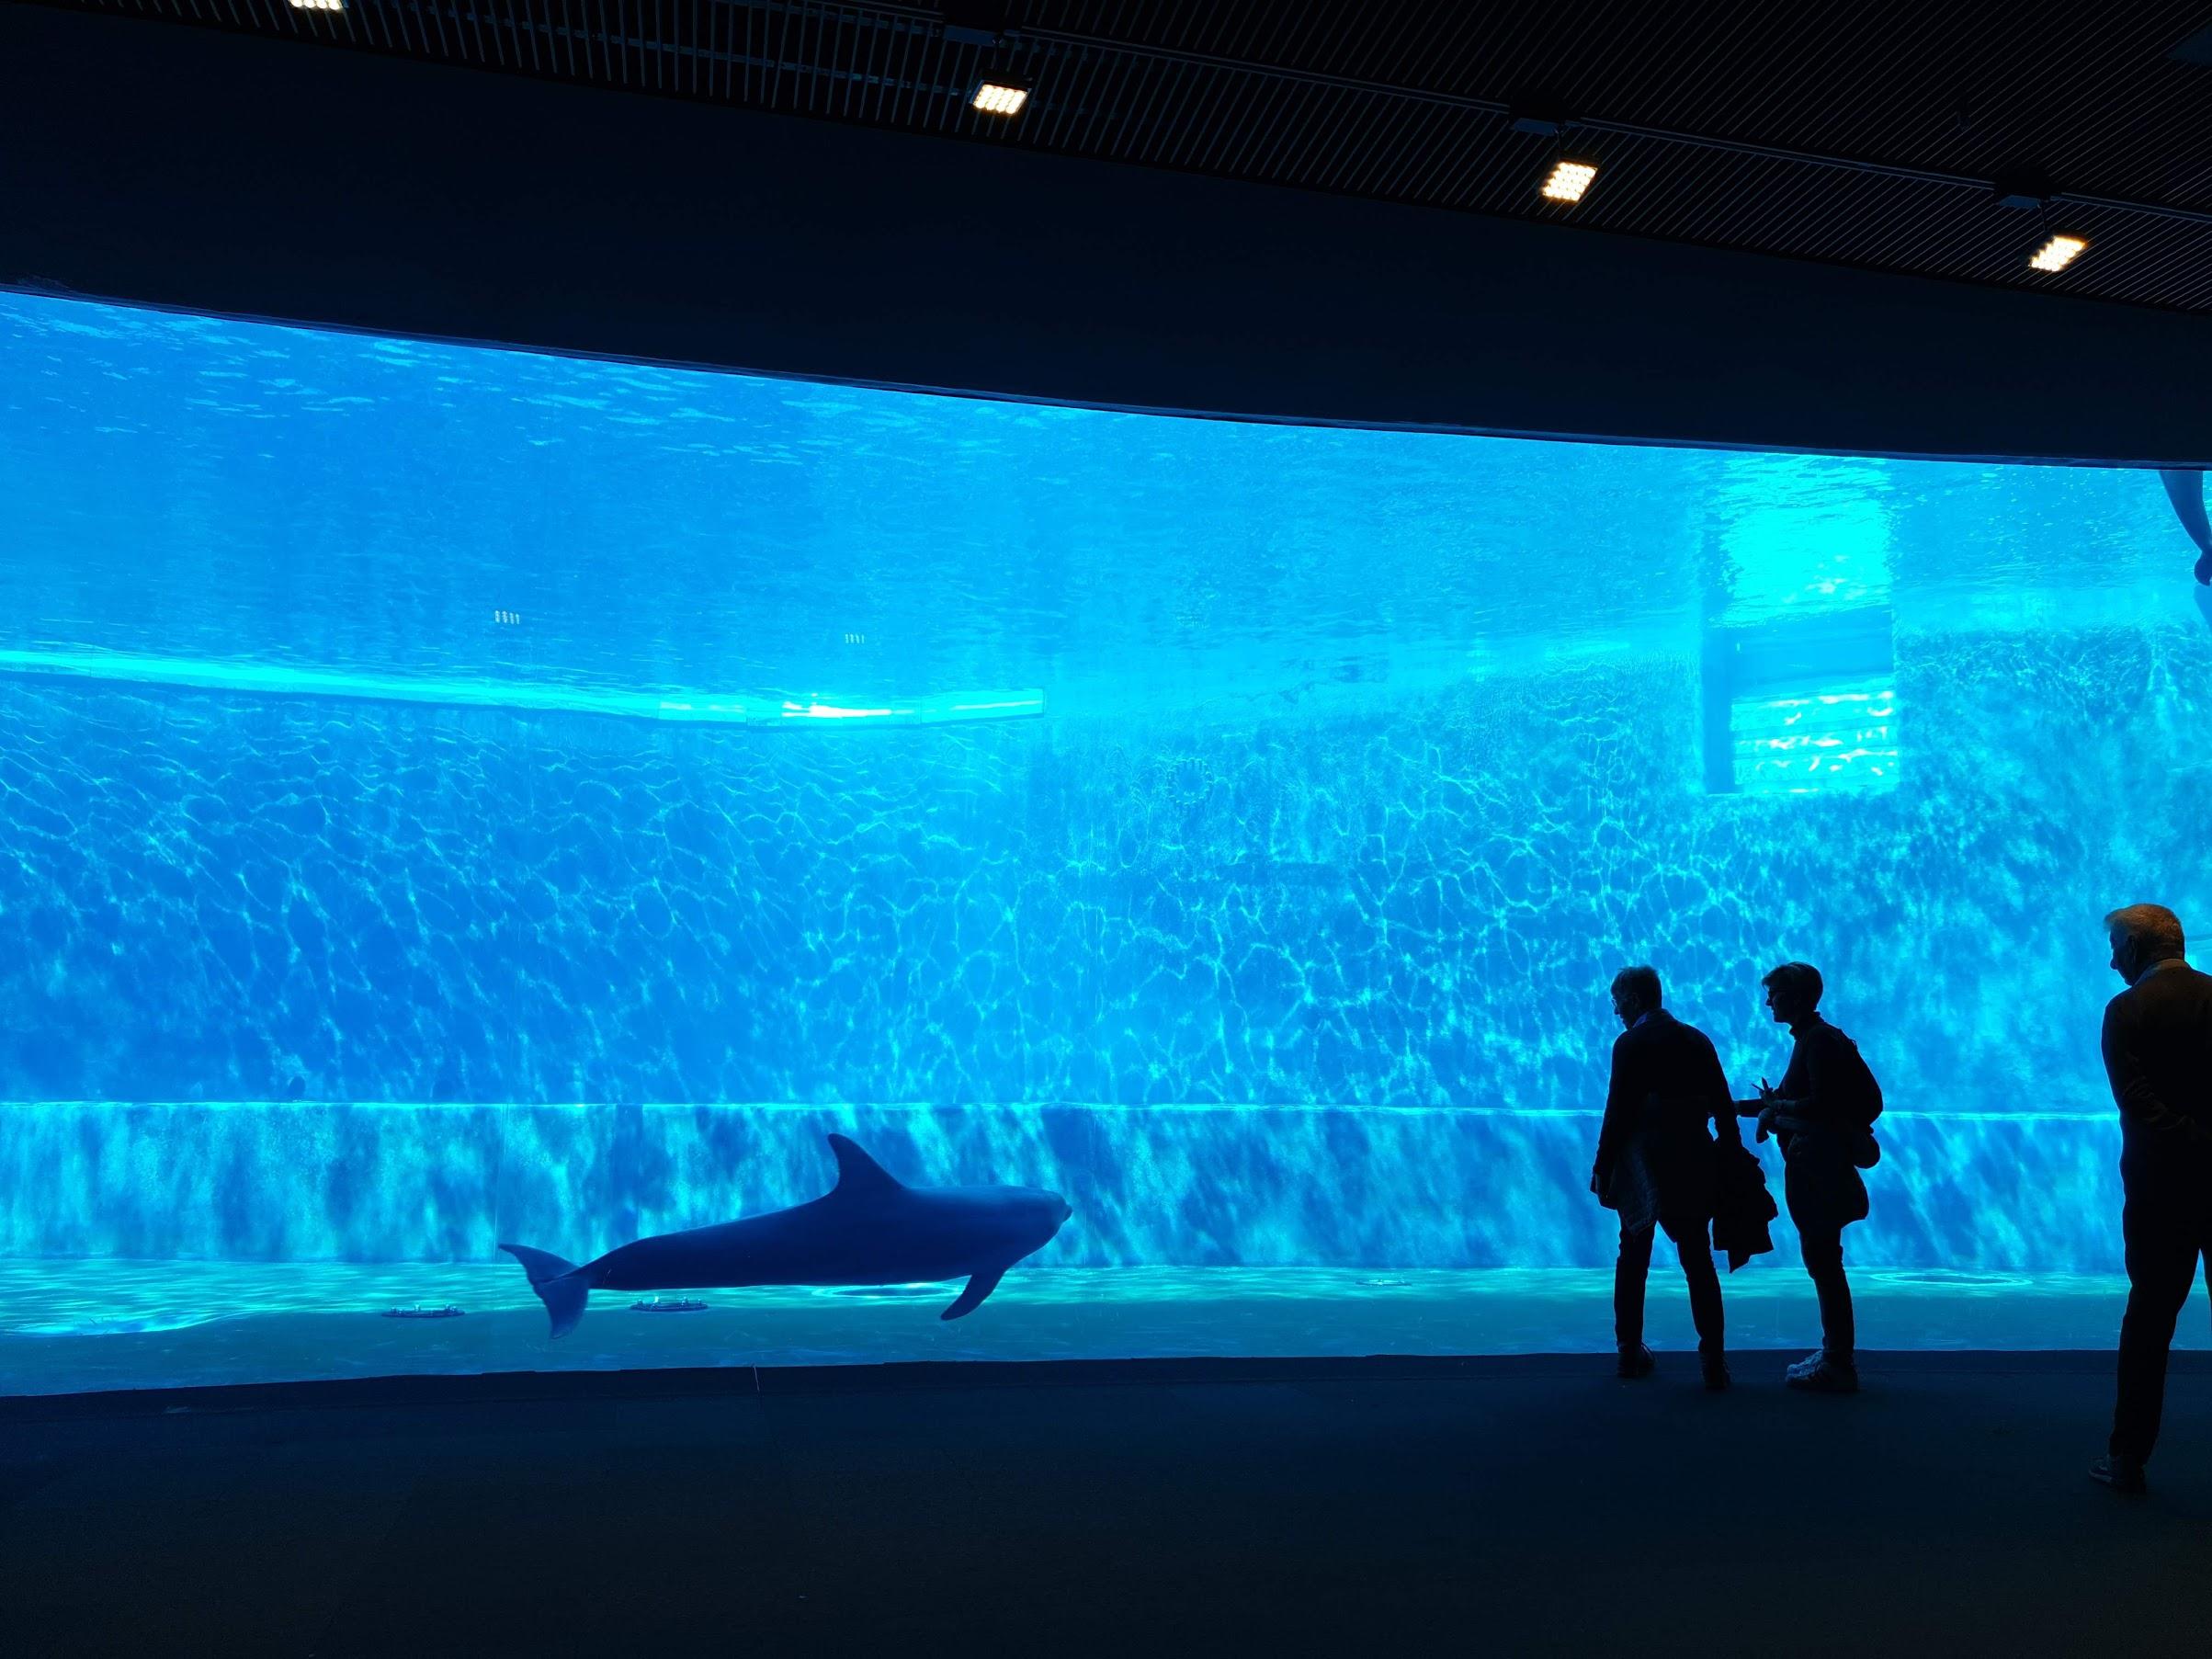 delfin, delfinariu, acvariul din genova, genoa aquarium, acvariul genova italia, acvariul genova harta